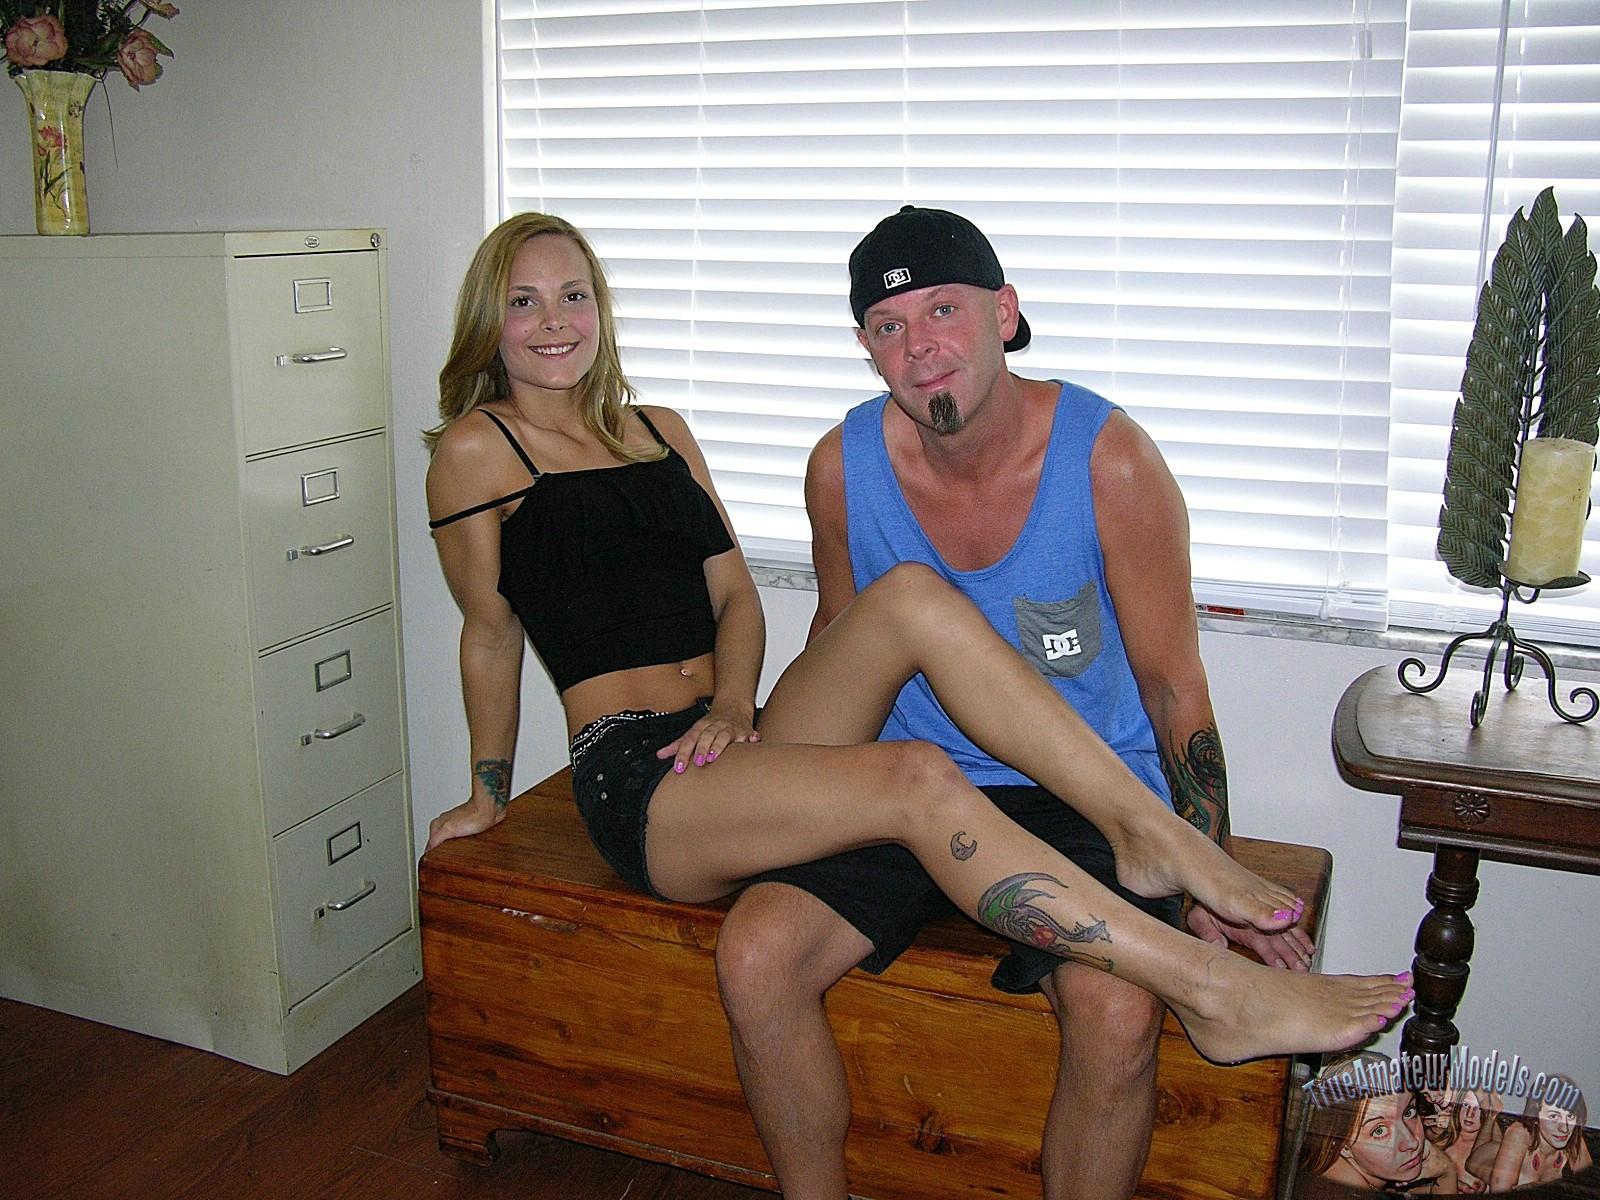 Ass Handjob jenny j. gives ray edwards a hand job after her amateur porn